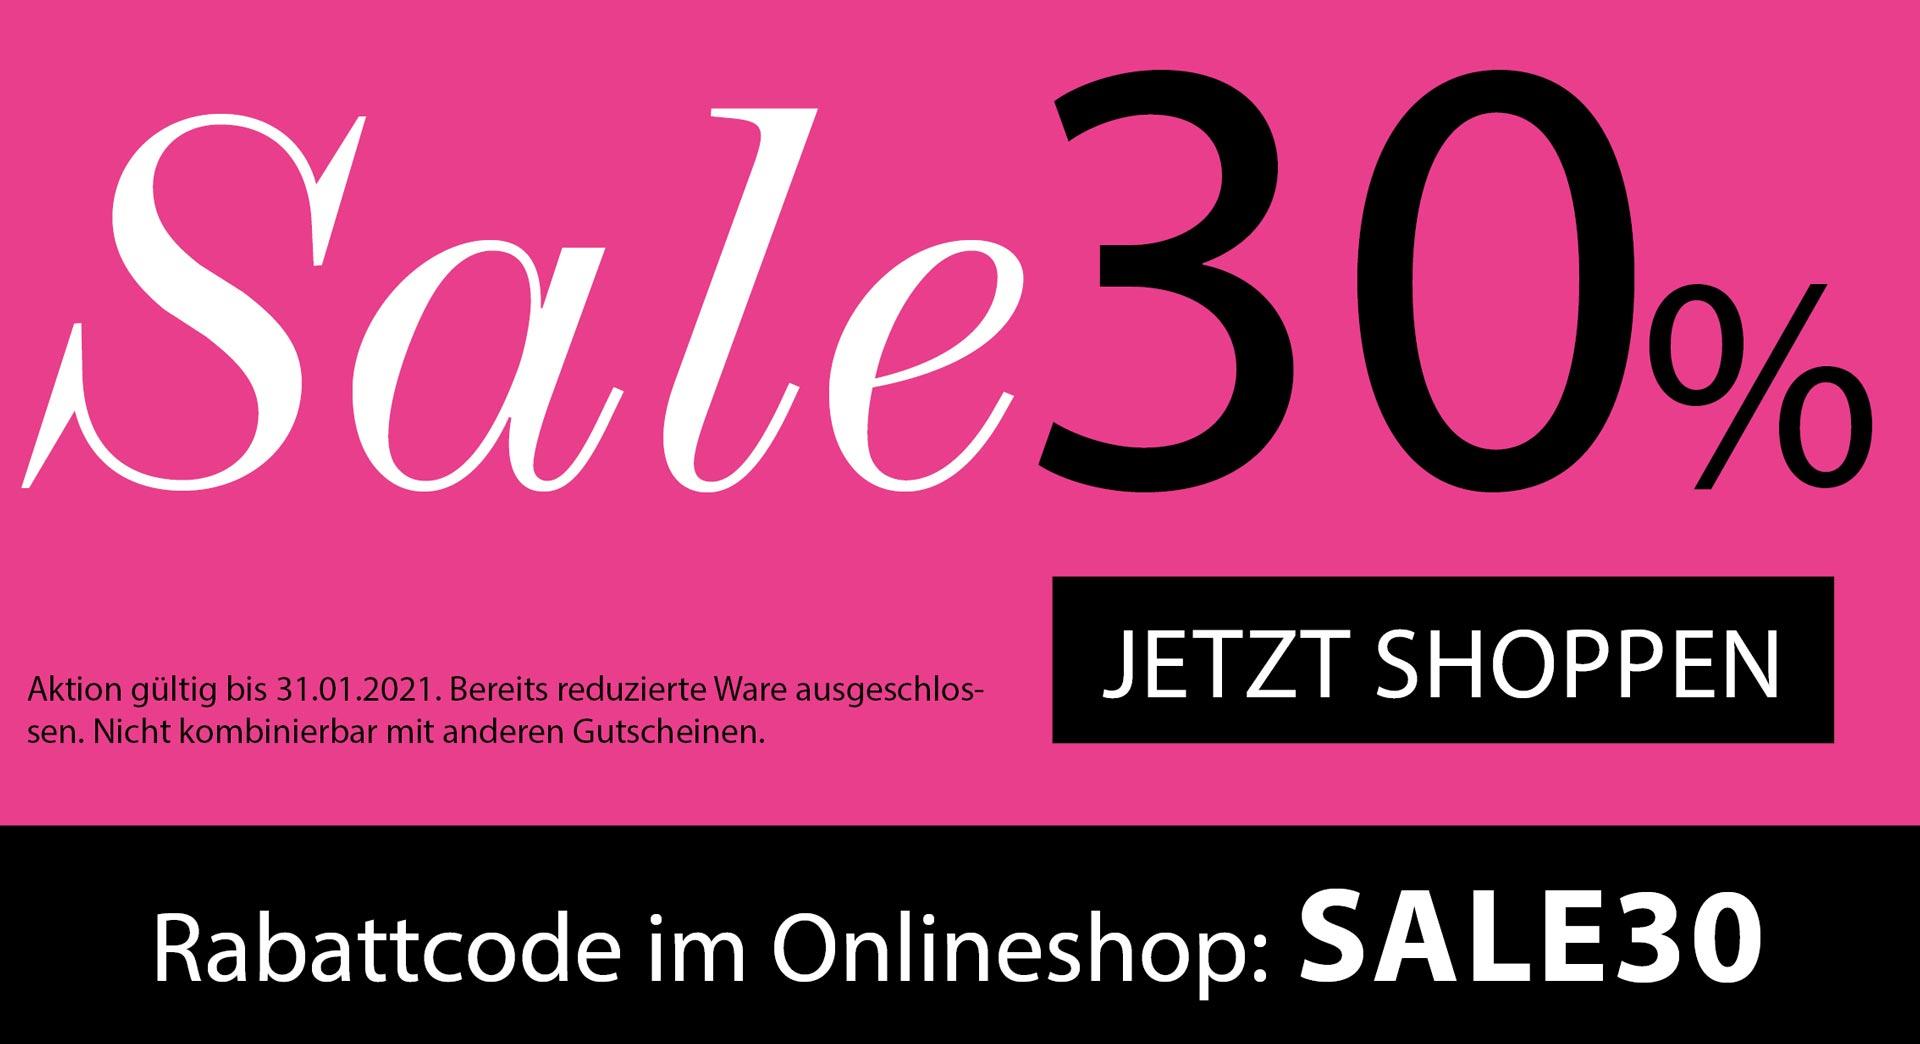 dekumodewelt-sale30-januar-2021-2